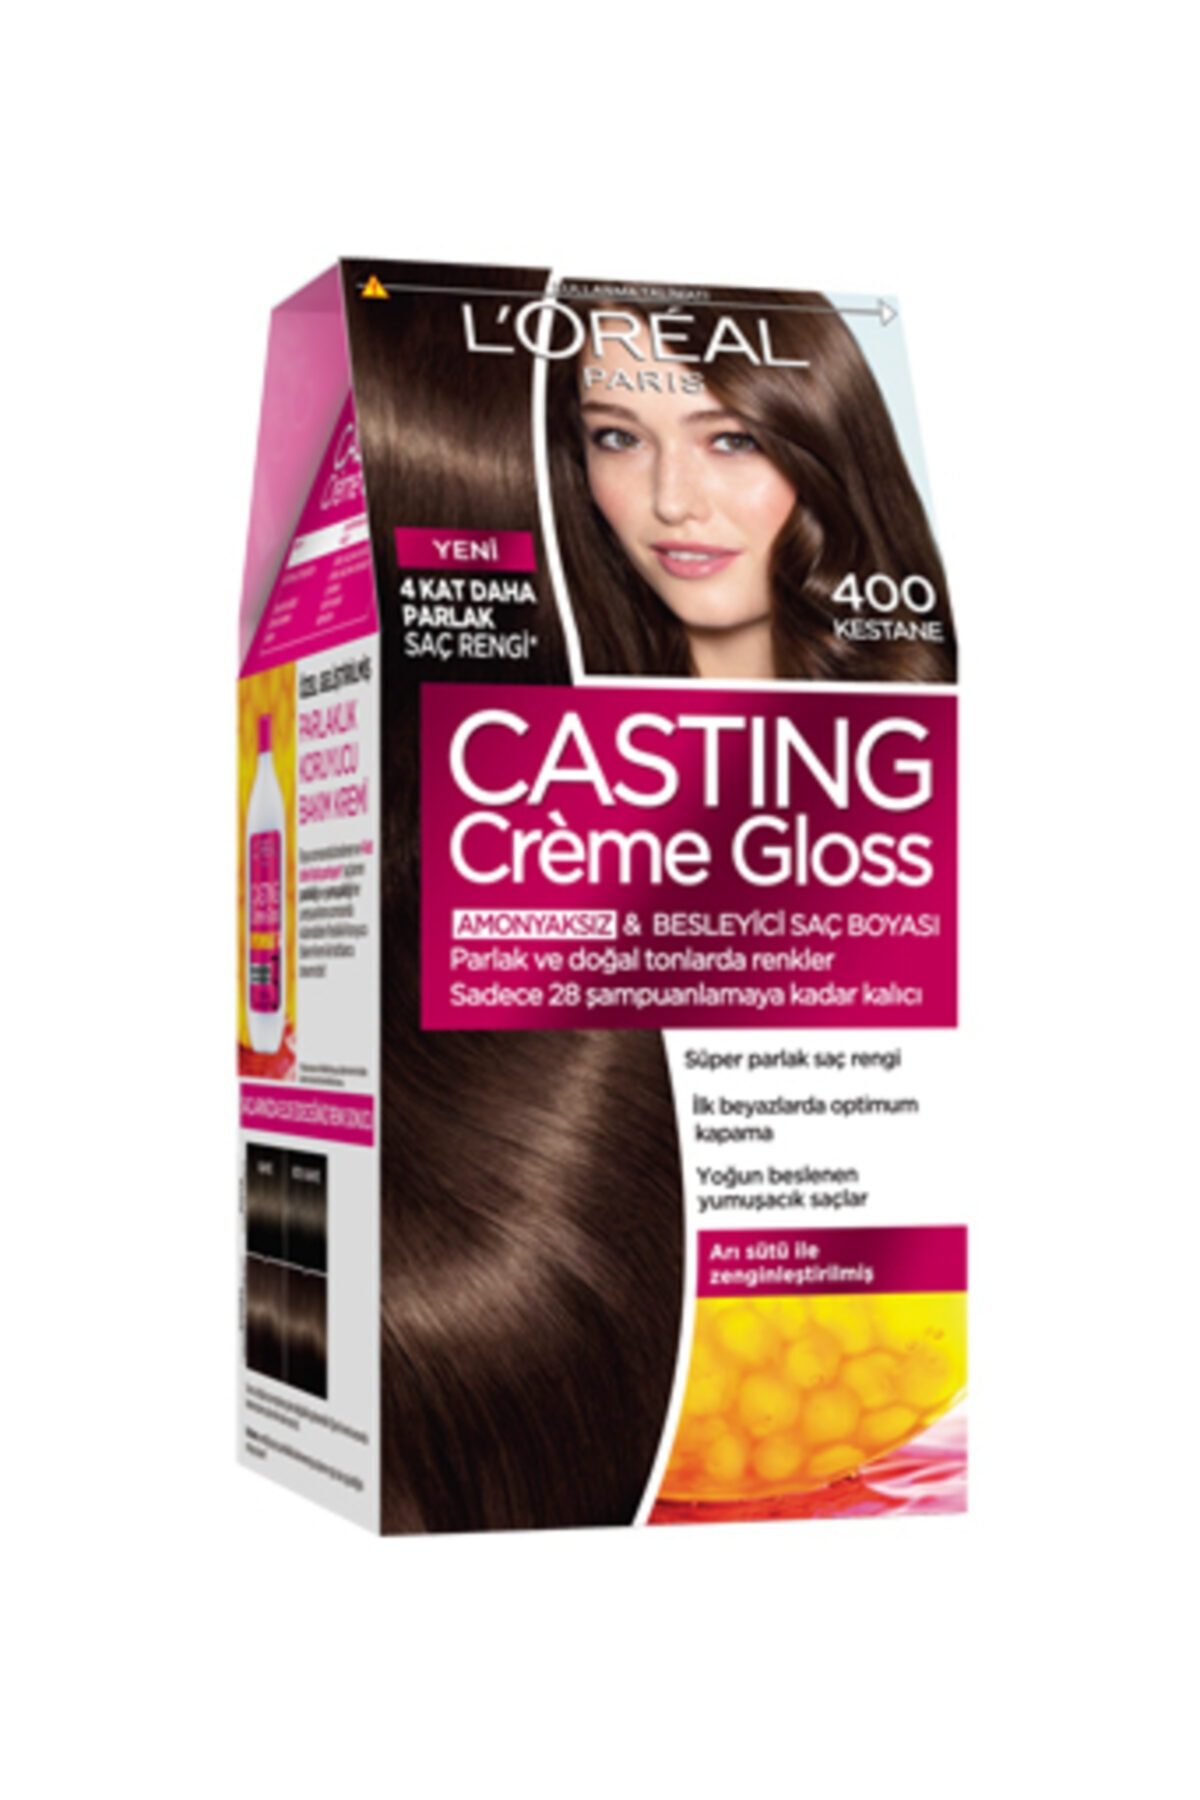 L'Oreal Paris Casting Creme Gloss Saç Boyası 400 Kestane 1